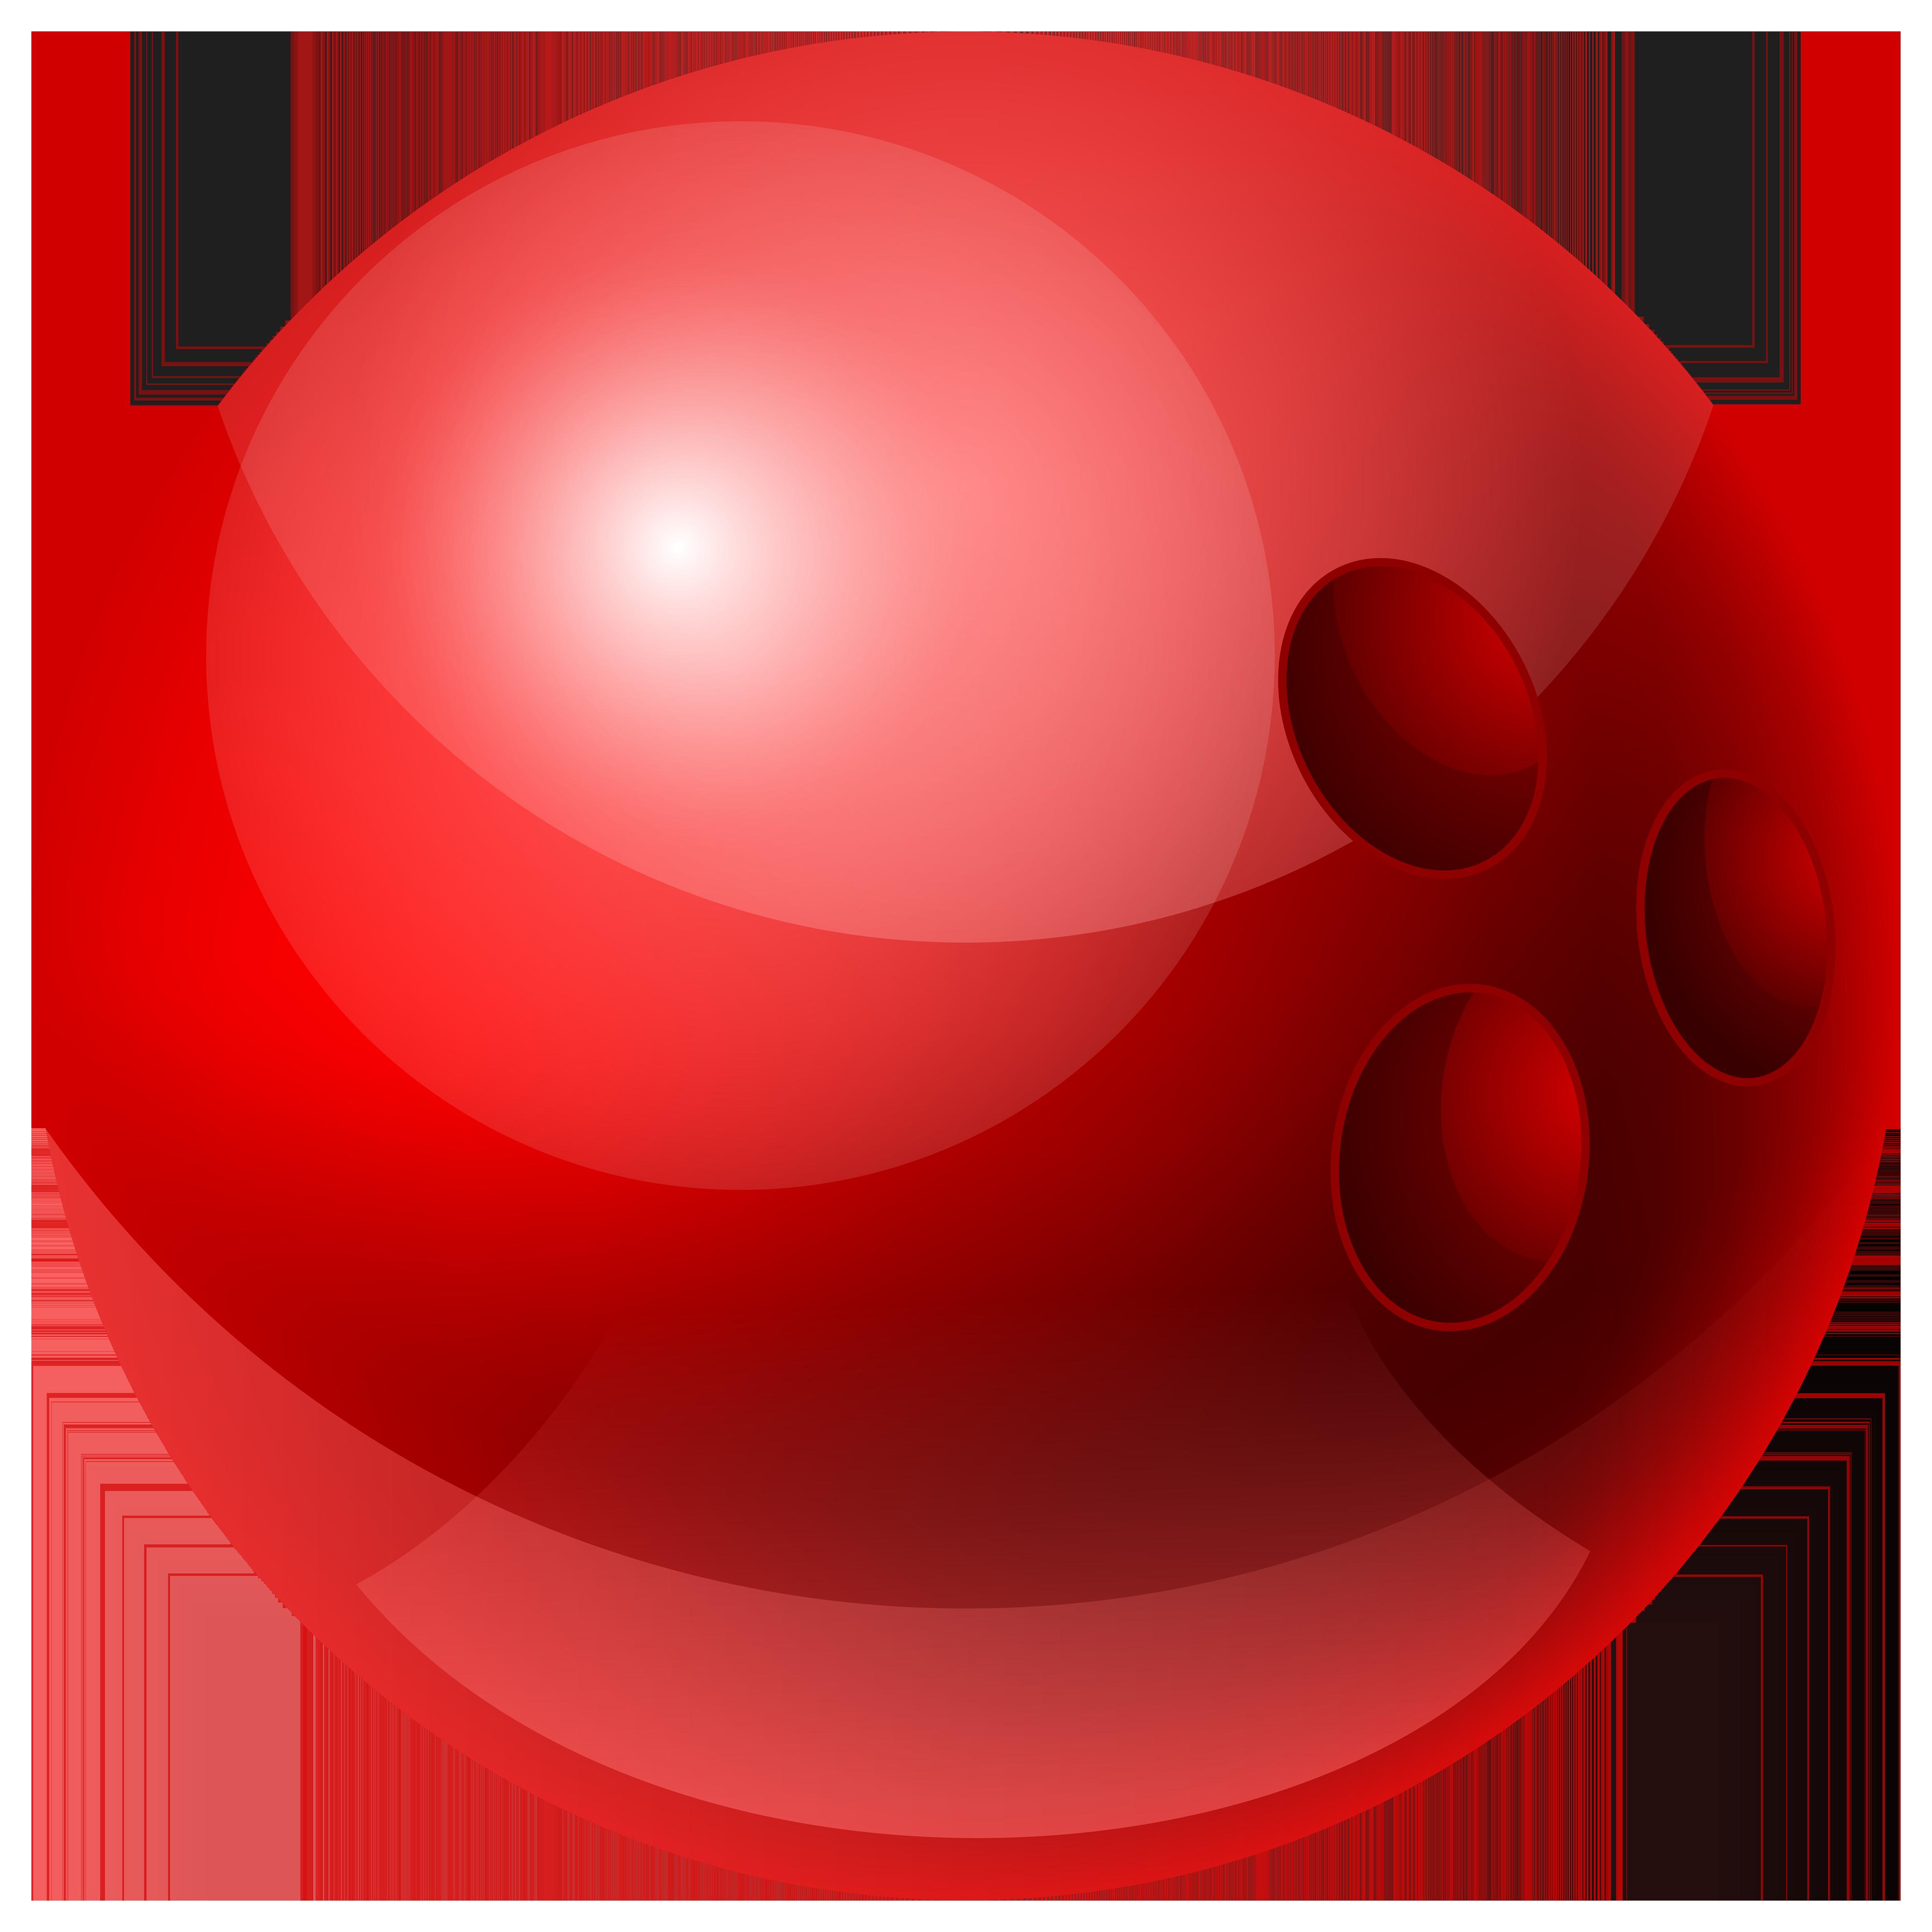 Bowling Ball PNG HD